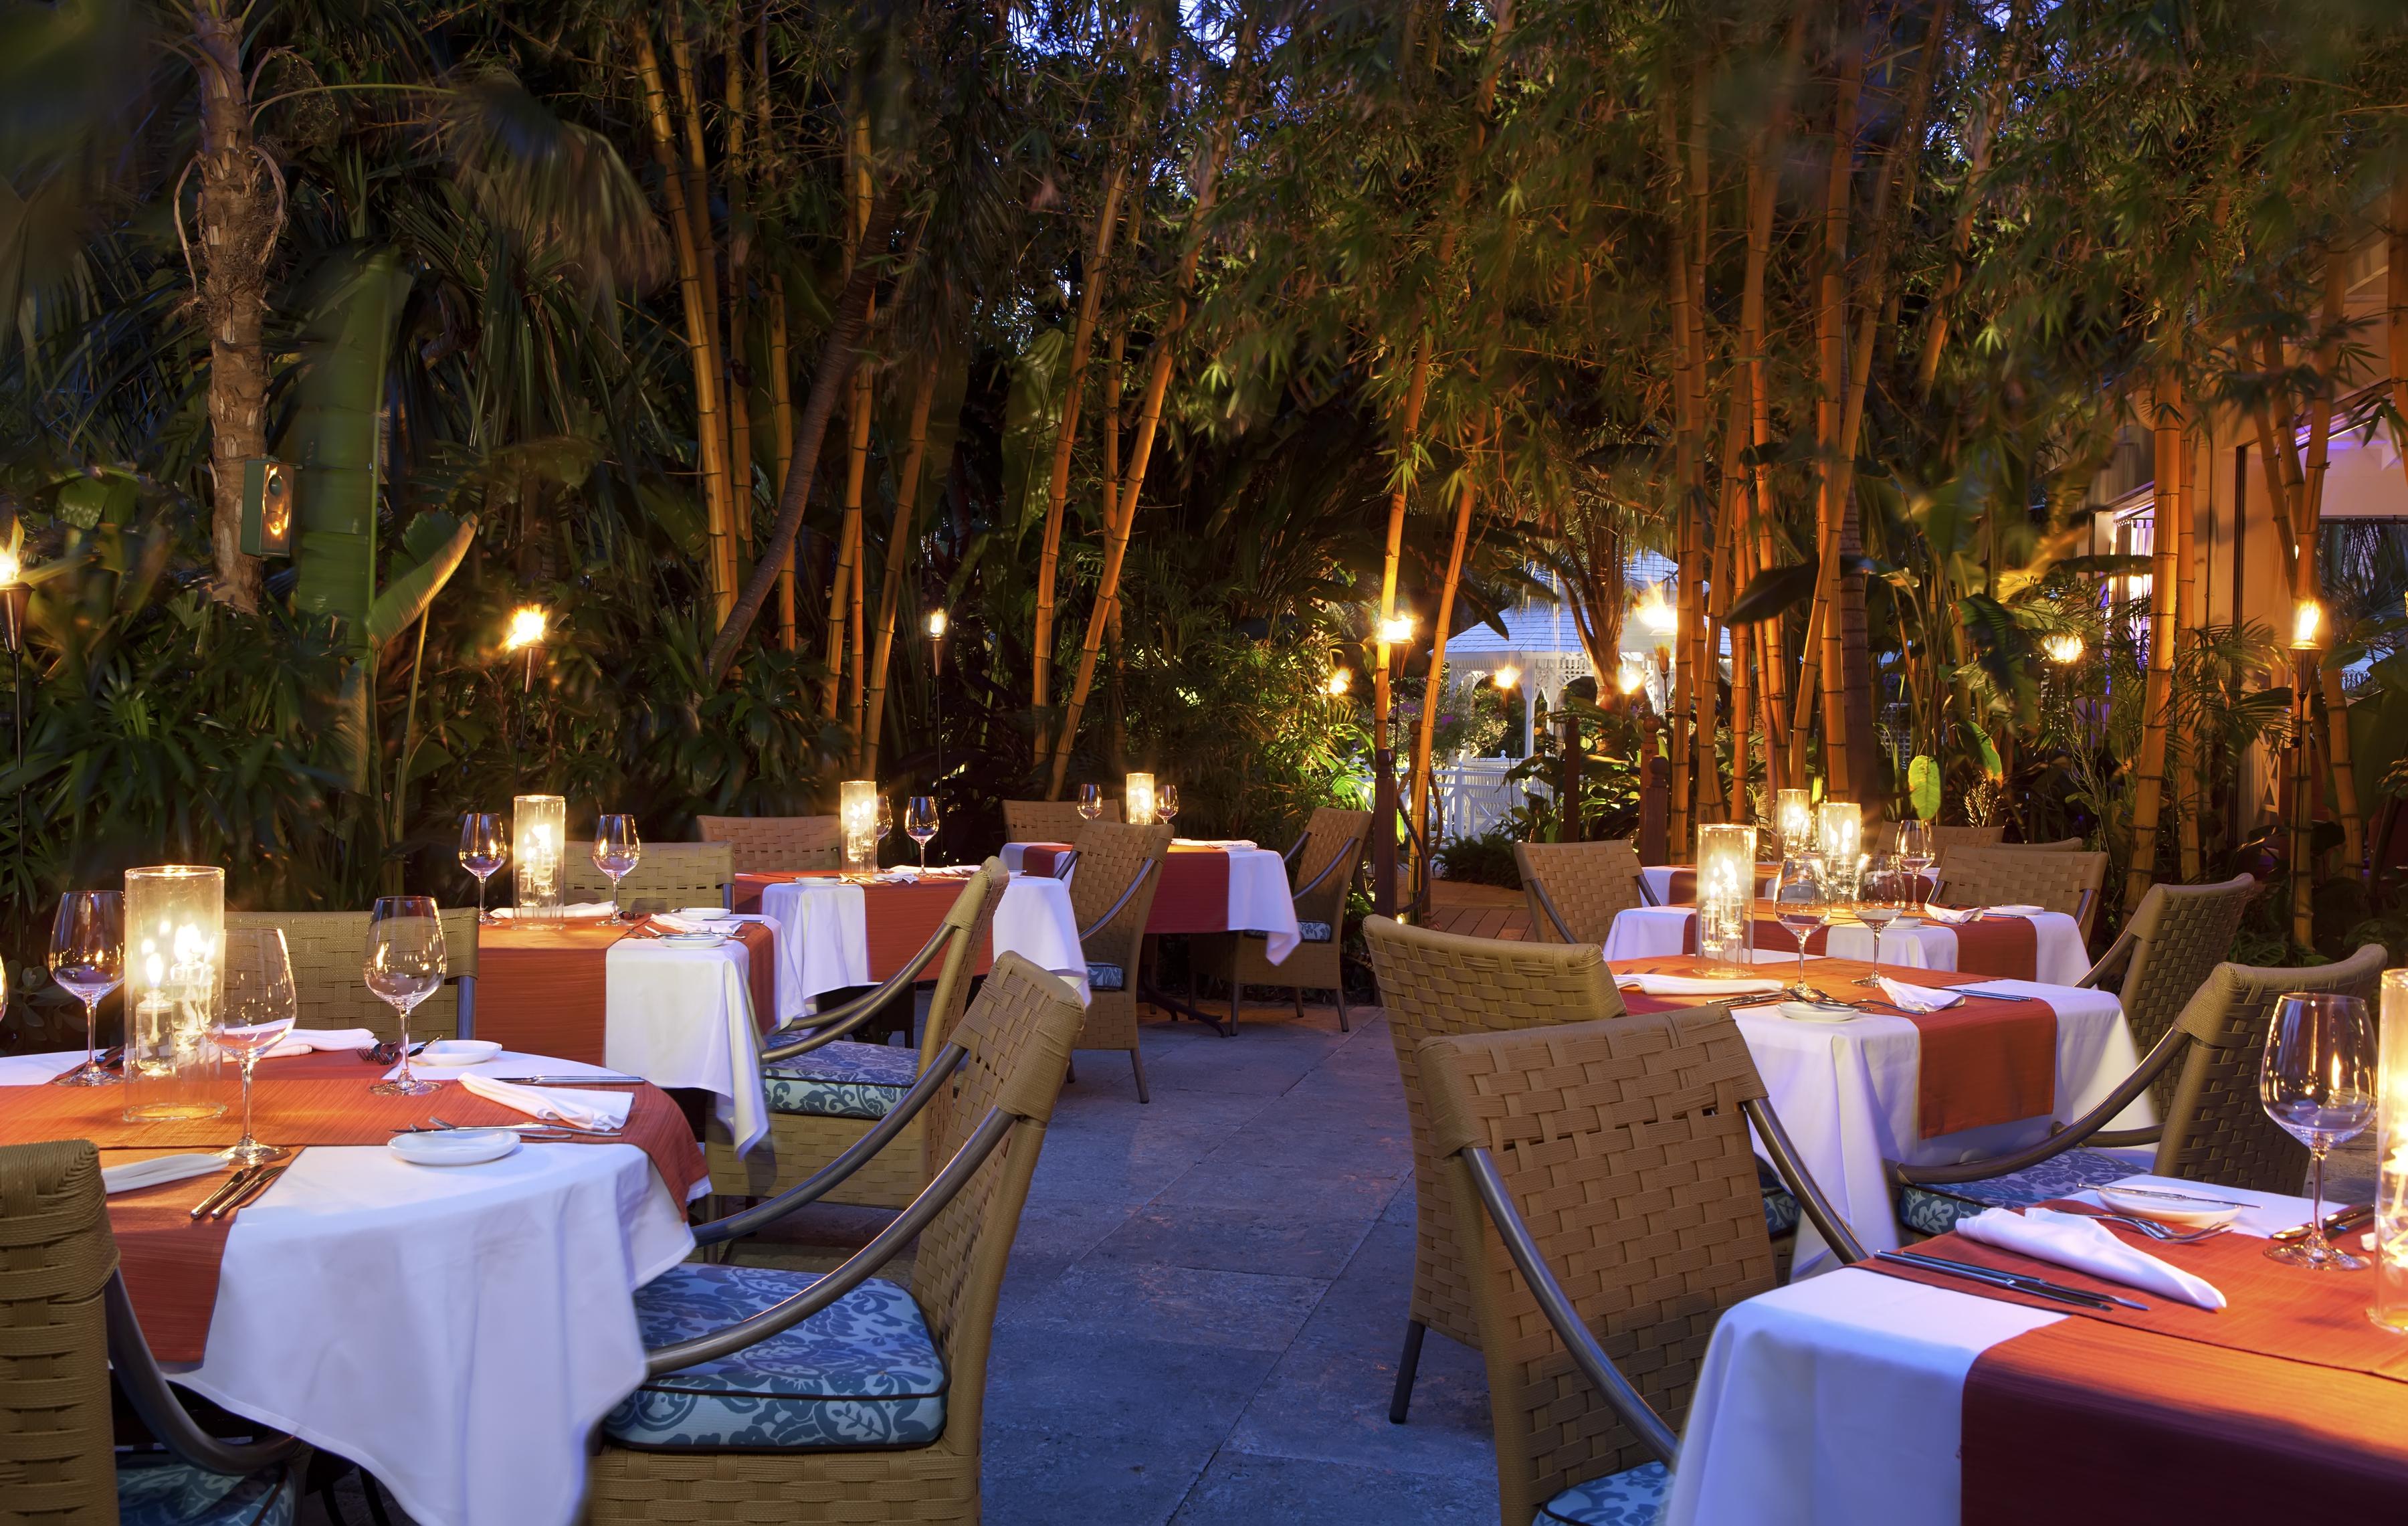 The Palms Hotel & Spa _ Essensia Restaurant & Lounge Terrace (2)